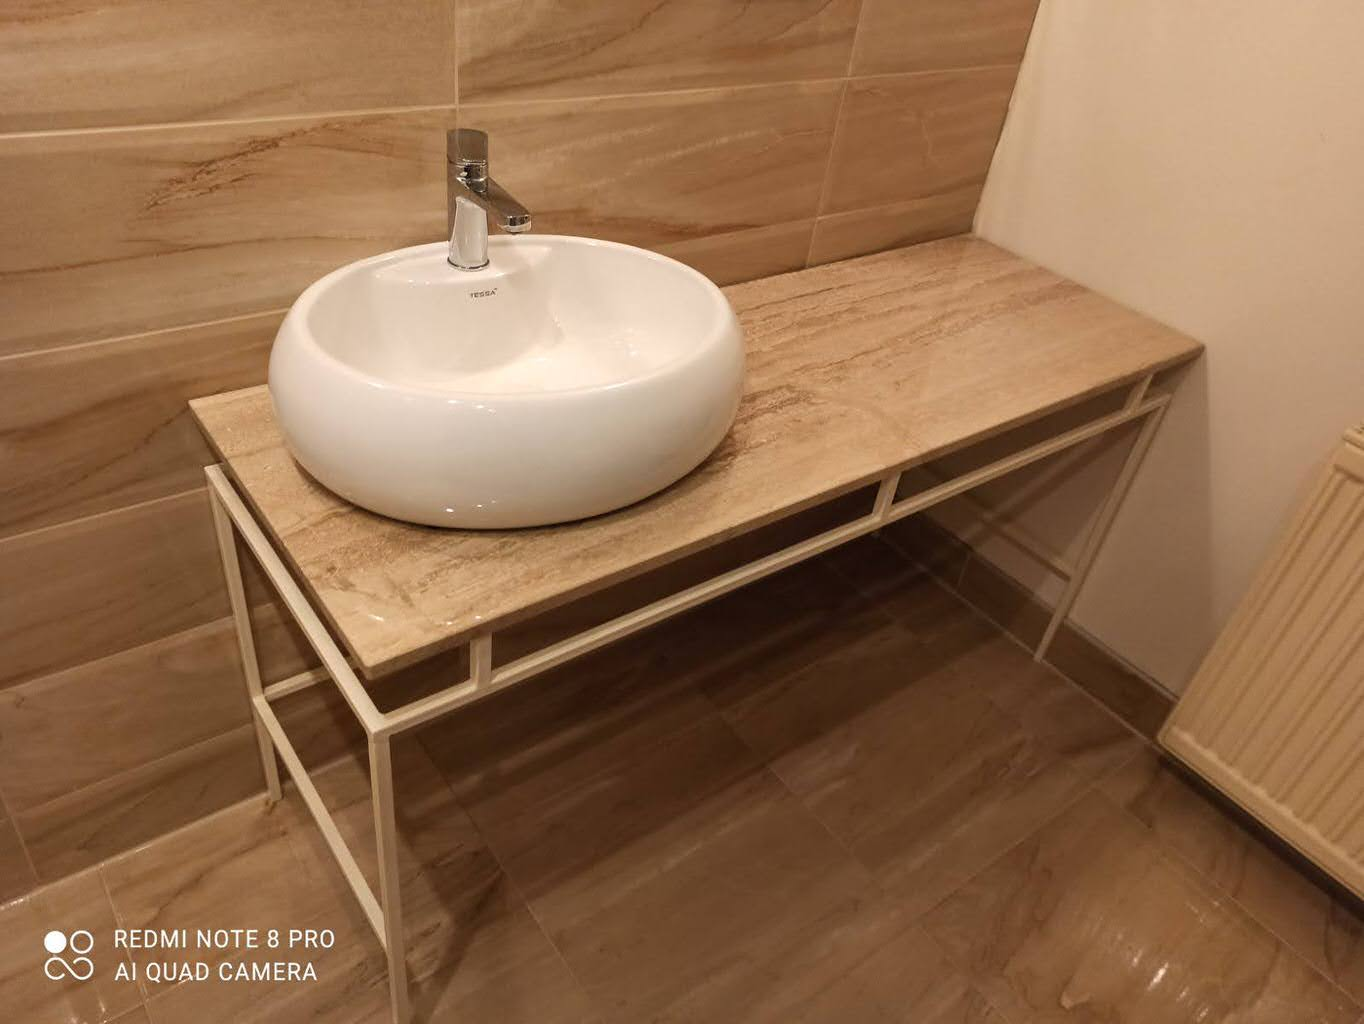 mermerna ploca za kupatilo